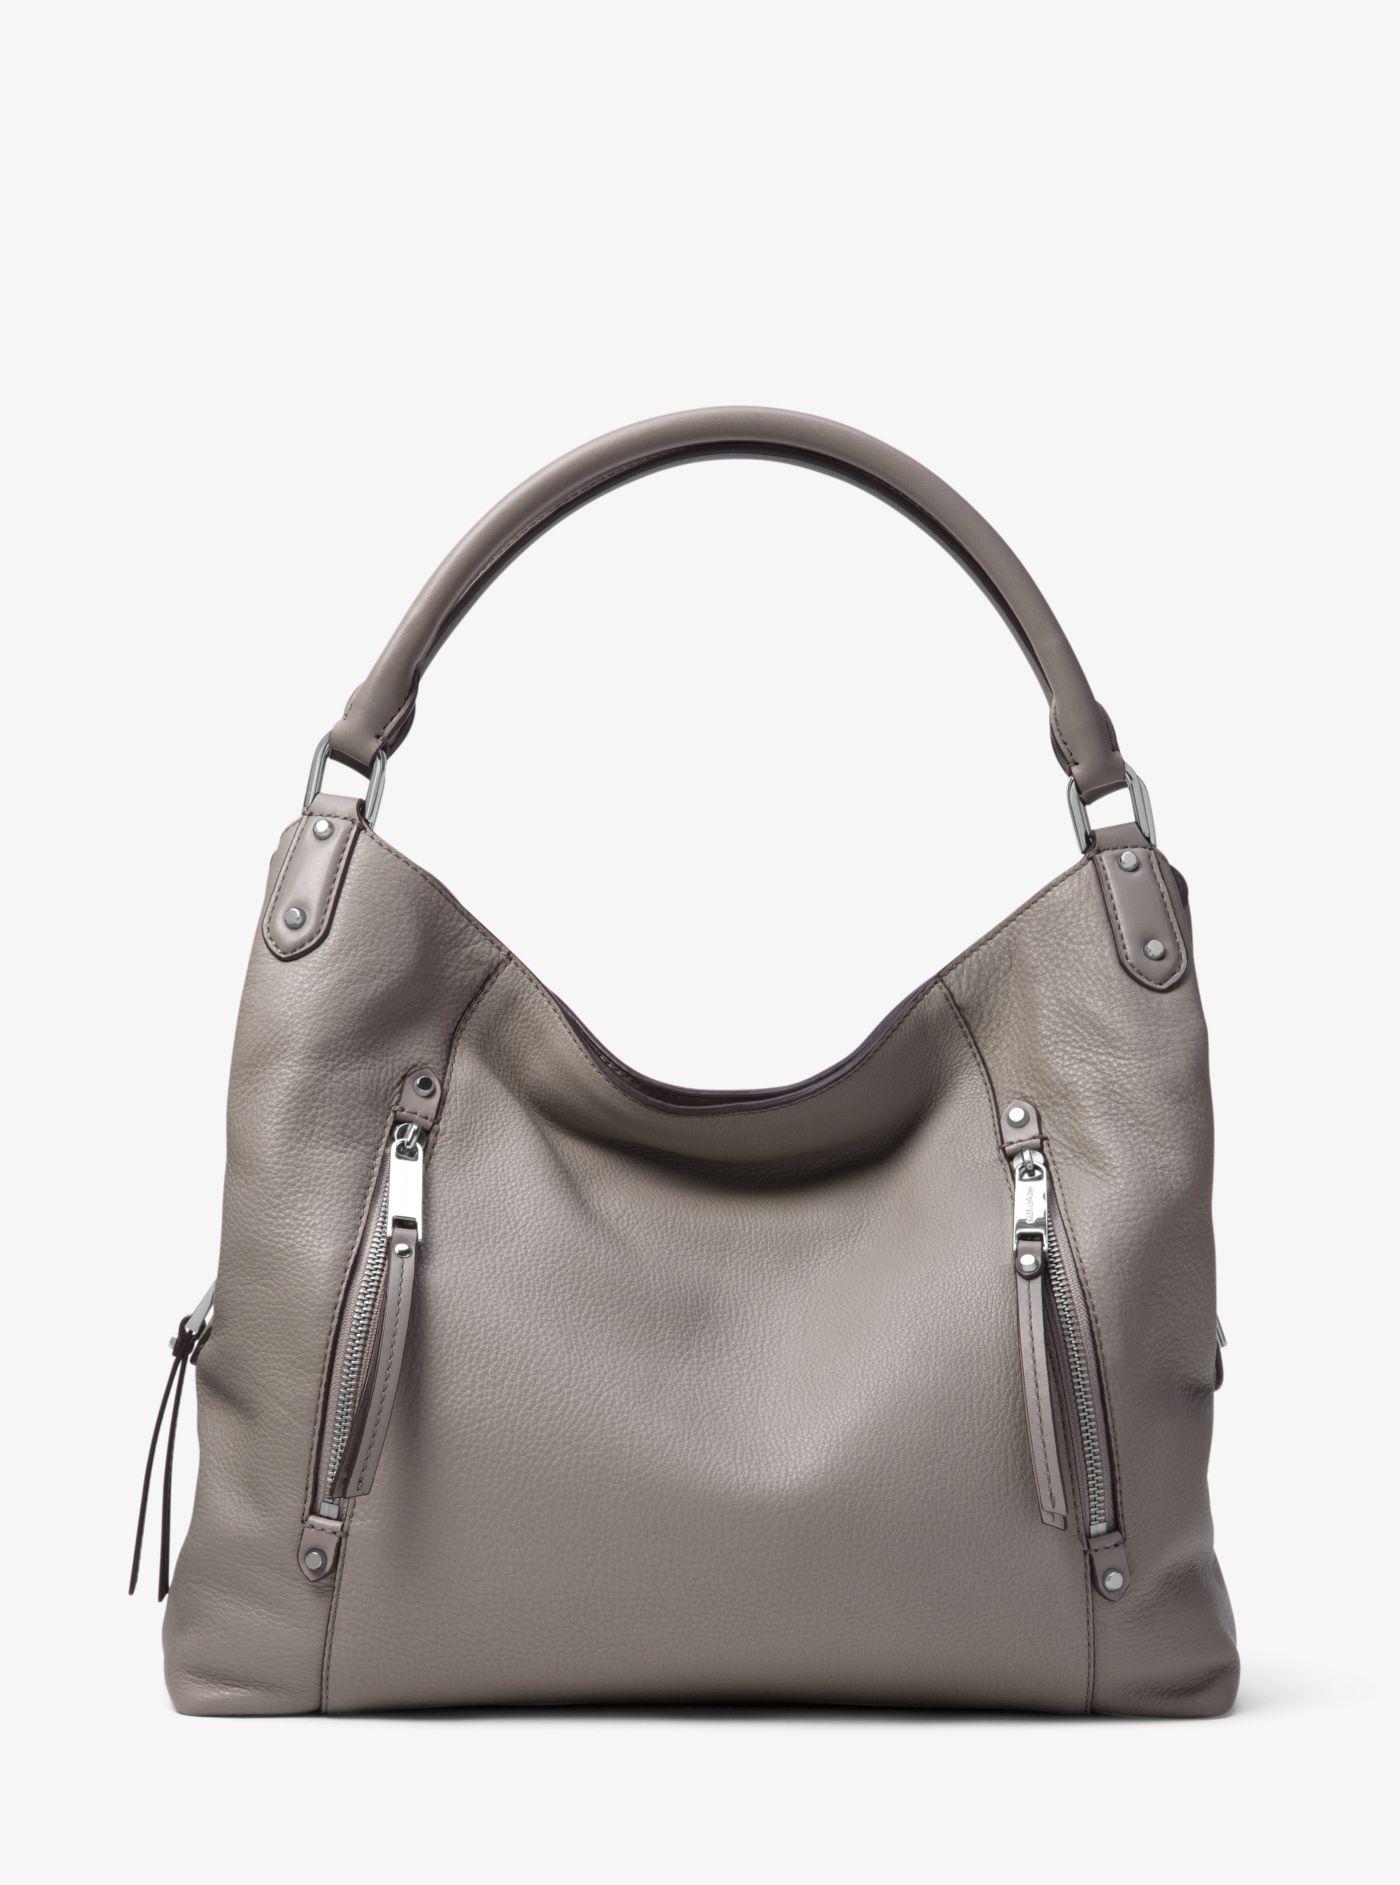 6913249b848d Lyst - Michael Kors Evie Large Leather Shoulder Bag in Gray